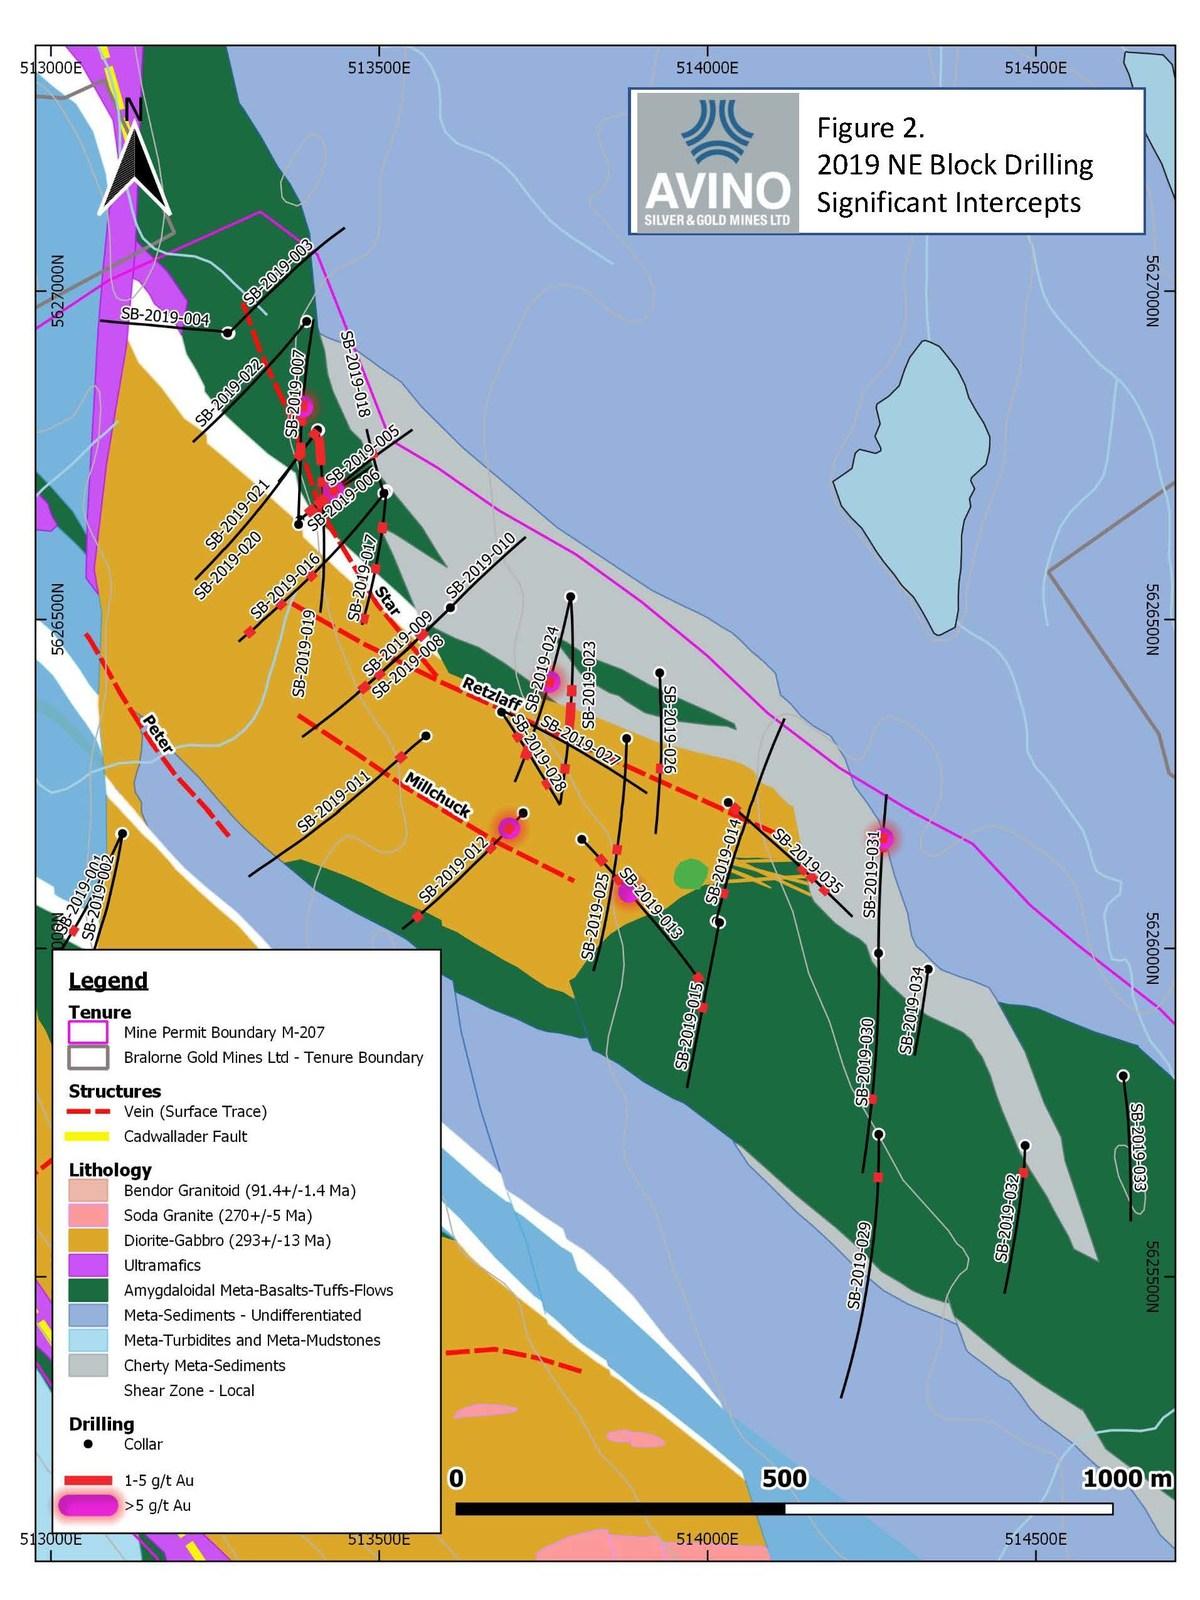 Figure 2 2019 NE Block Drilling Significant Intercepts